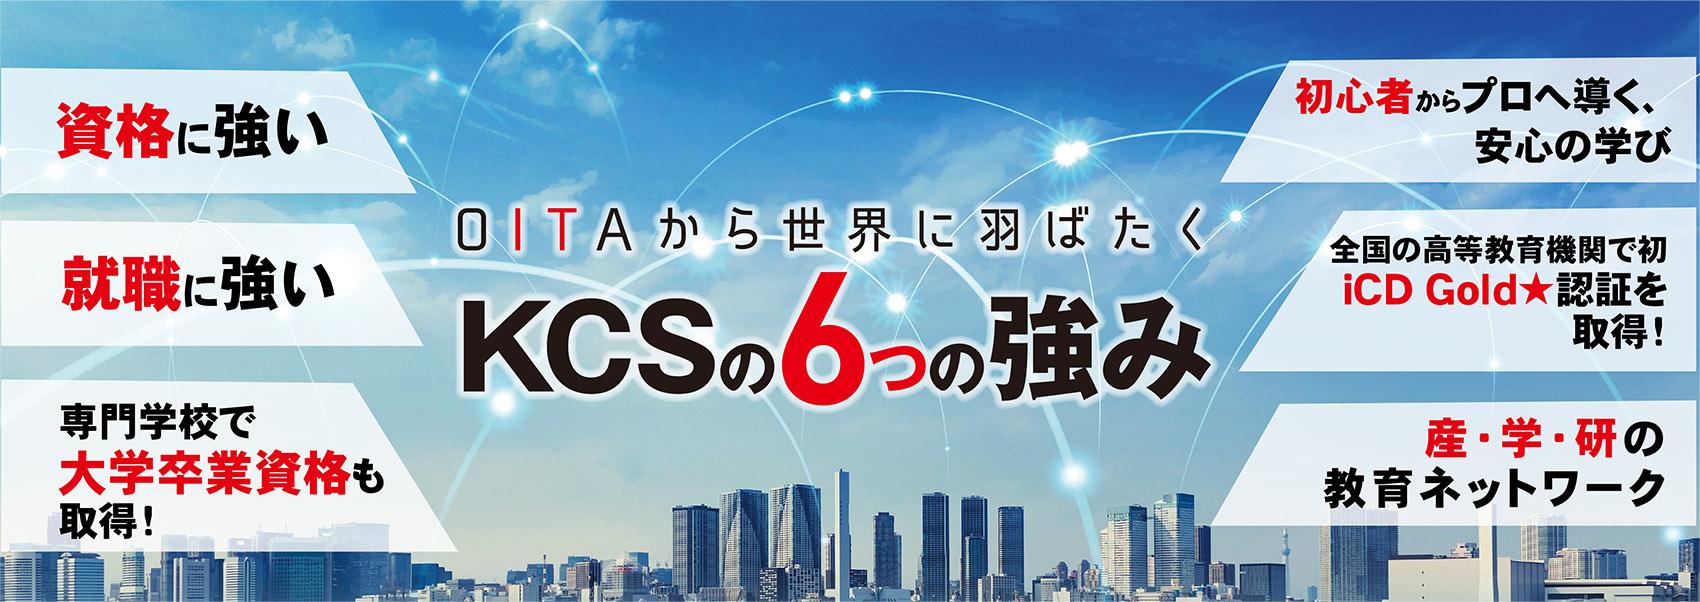 KCSの6つの強み